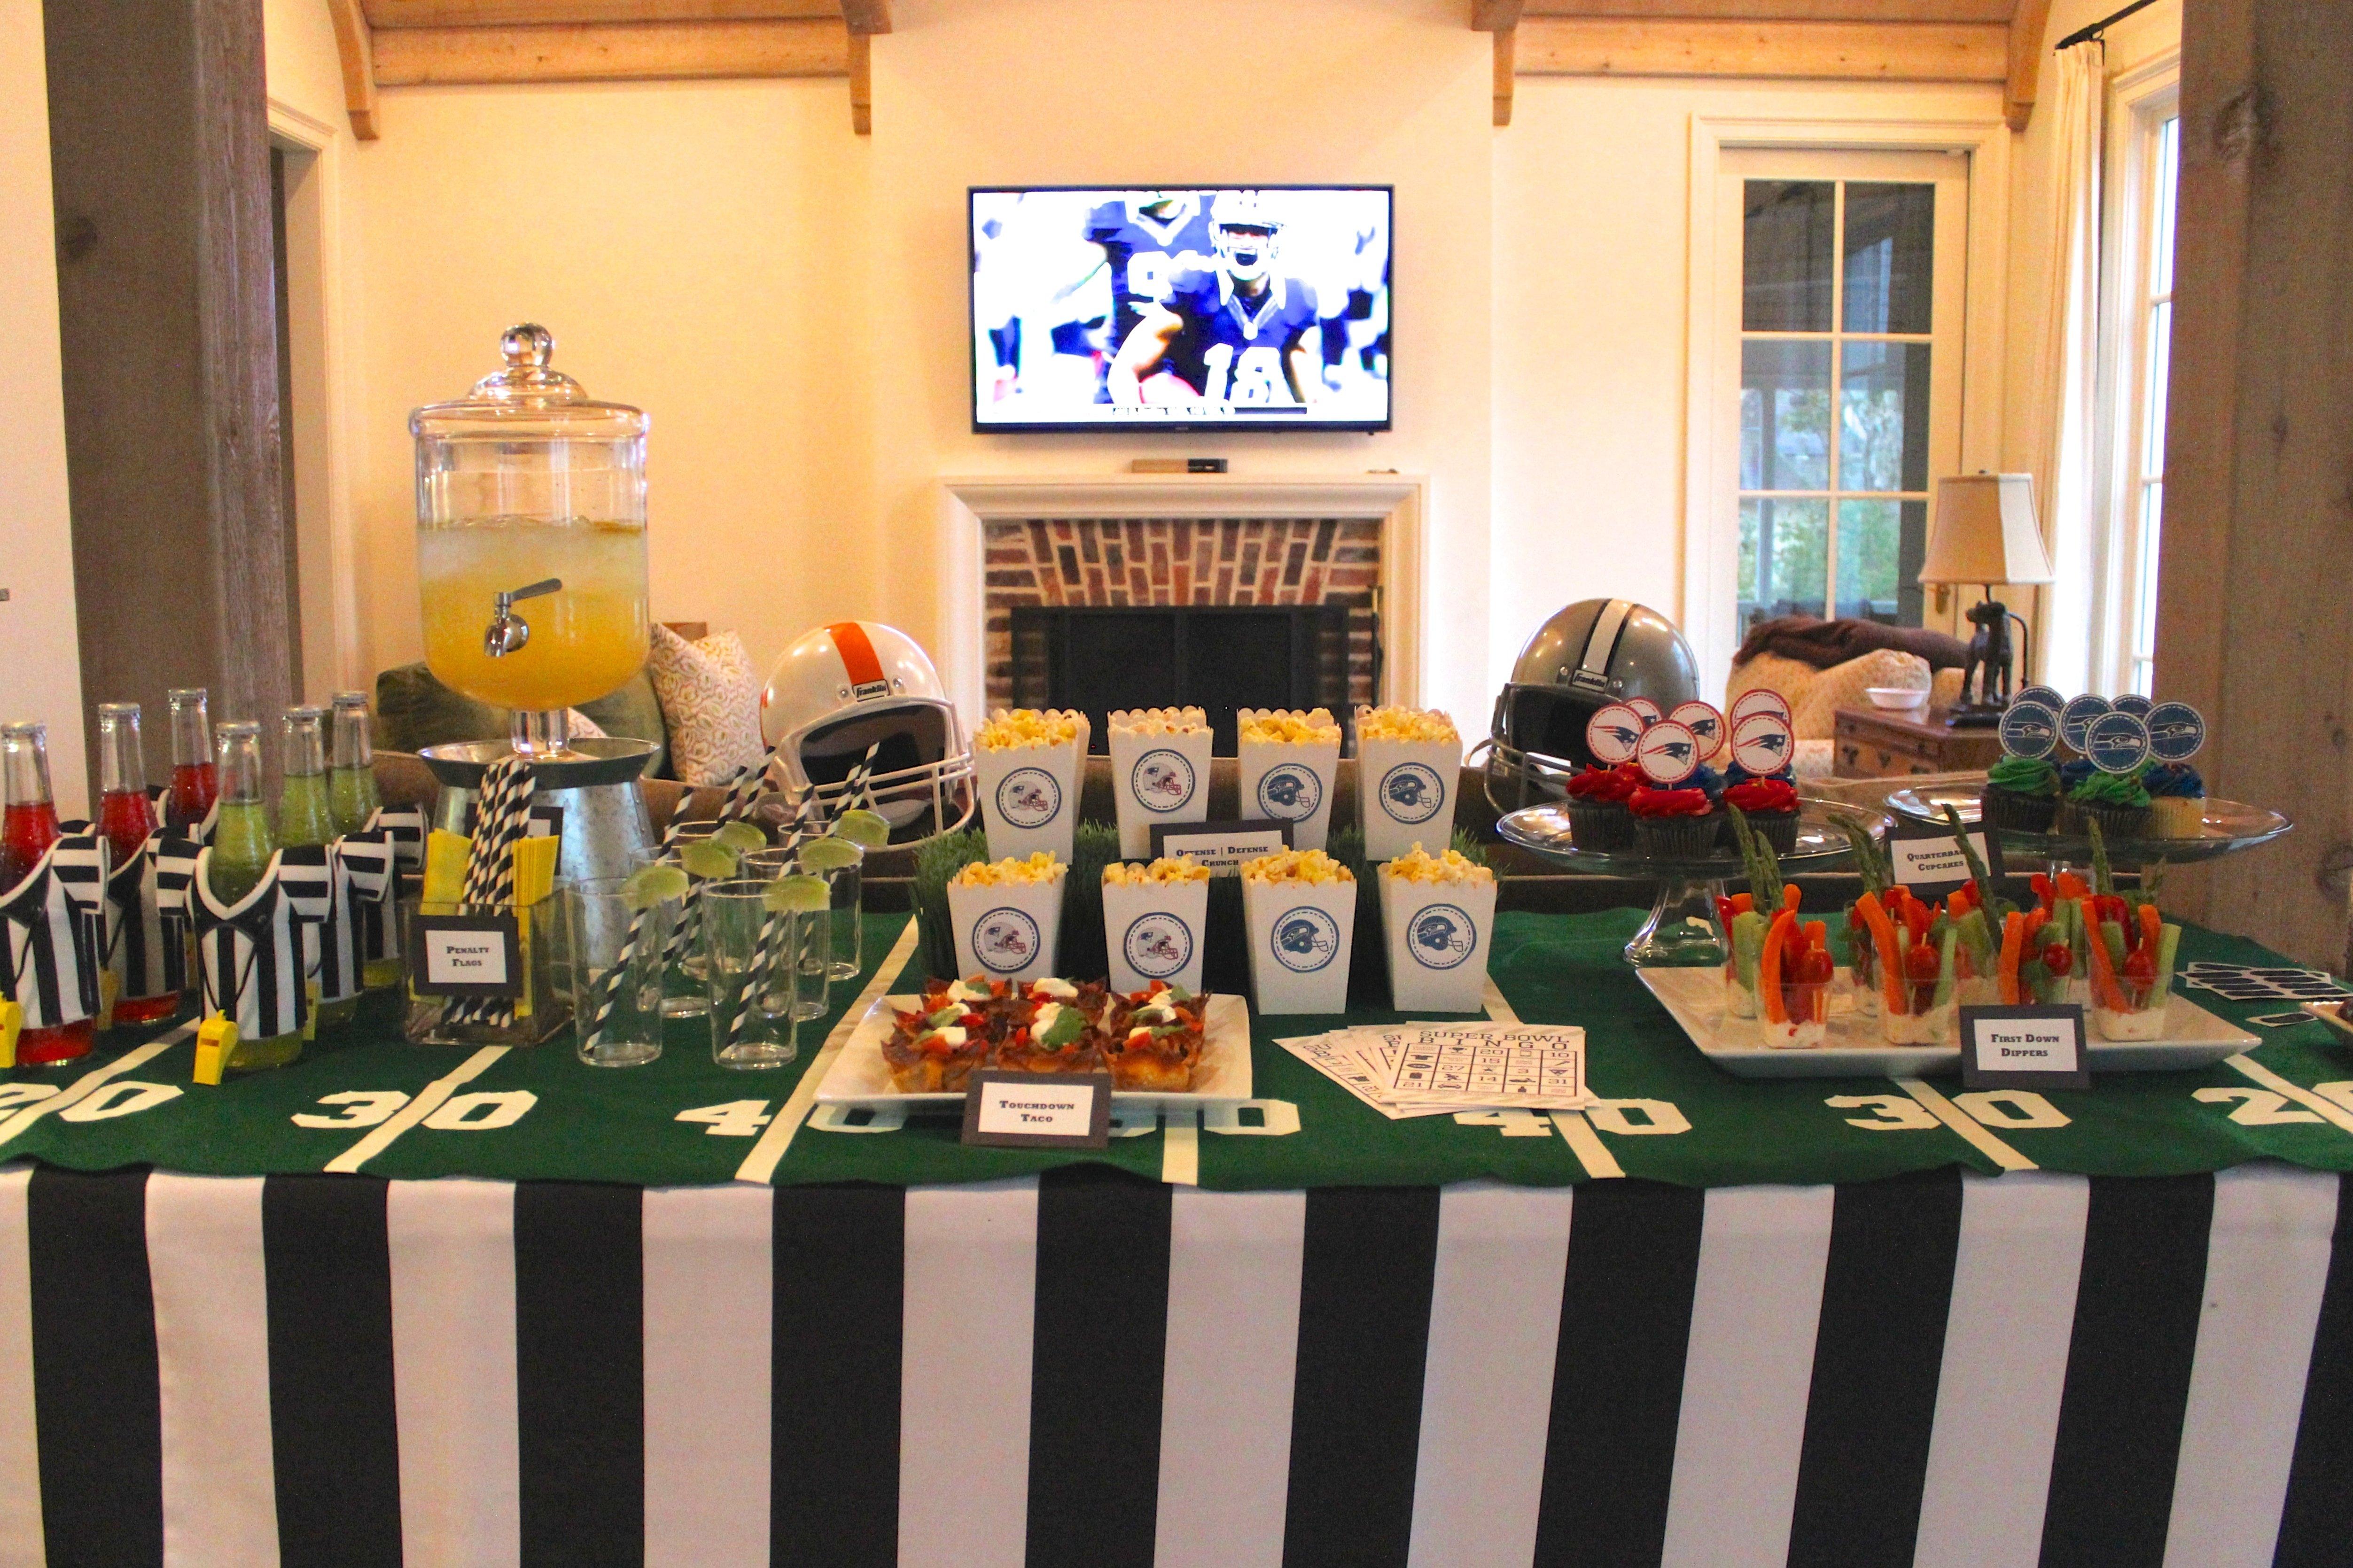 10 Amazing Super Bowl Party Decorating Ideas decorating a winning super bowl party ideas lifestyle 2020